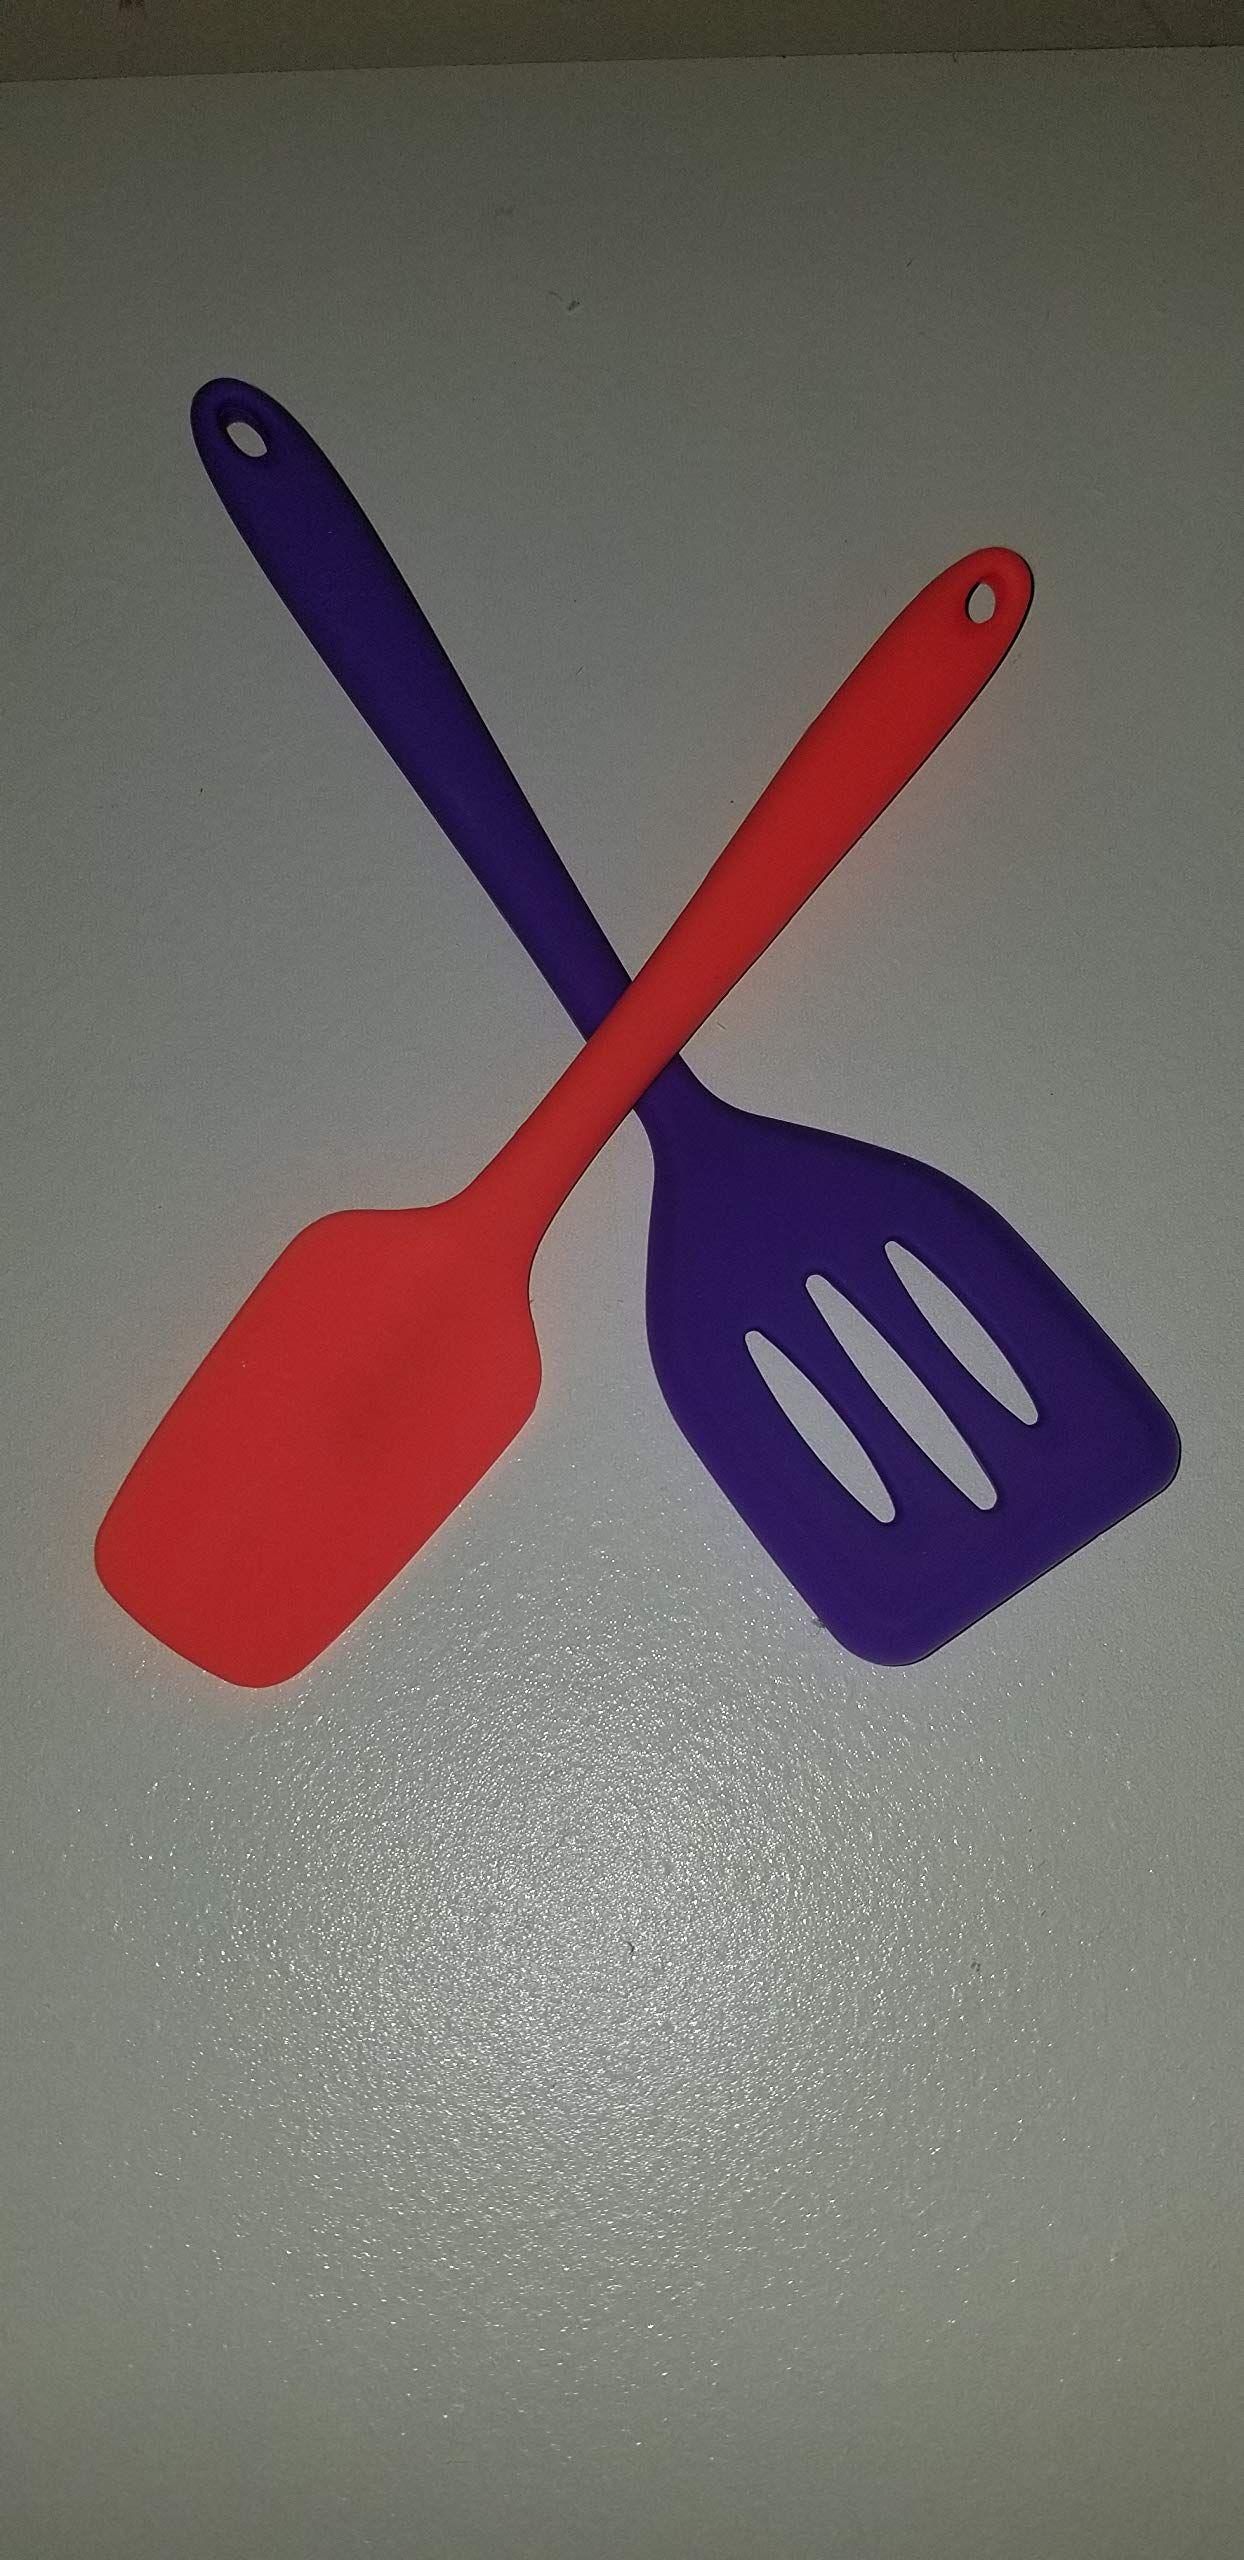 Core Kitchen 2pc Set Of Silicone Mini Utensil Set Orange Allpurpose Spatula And Purple Slotted Turner Visit The